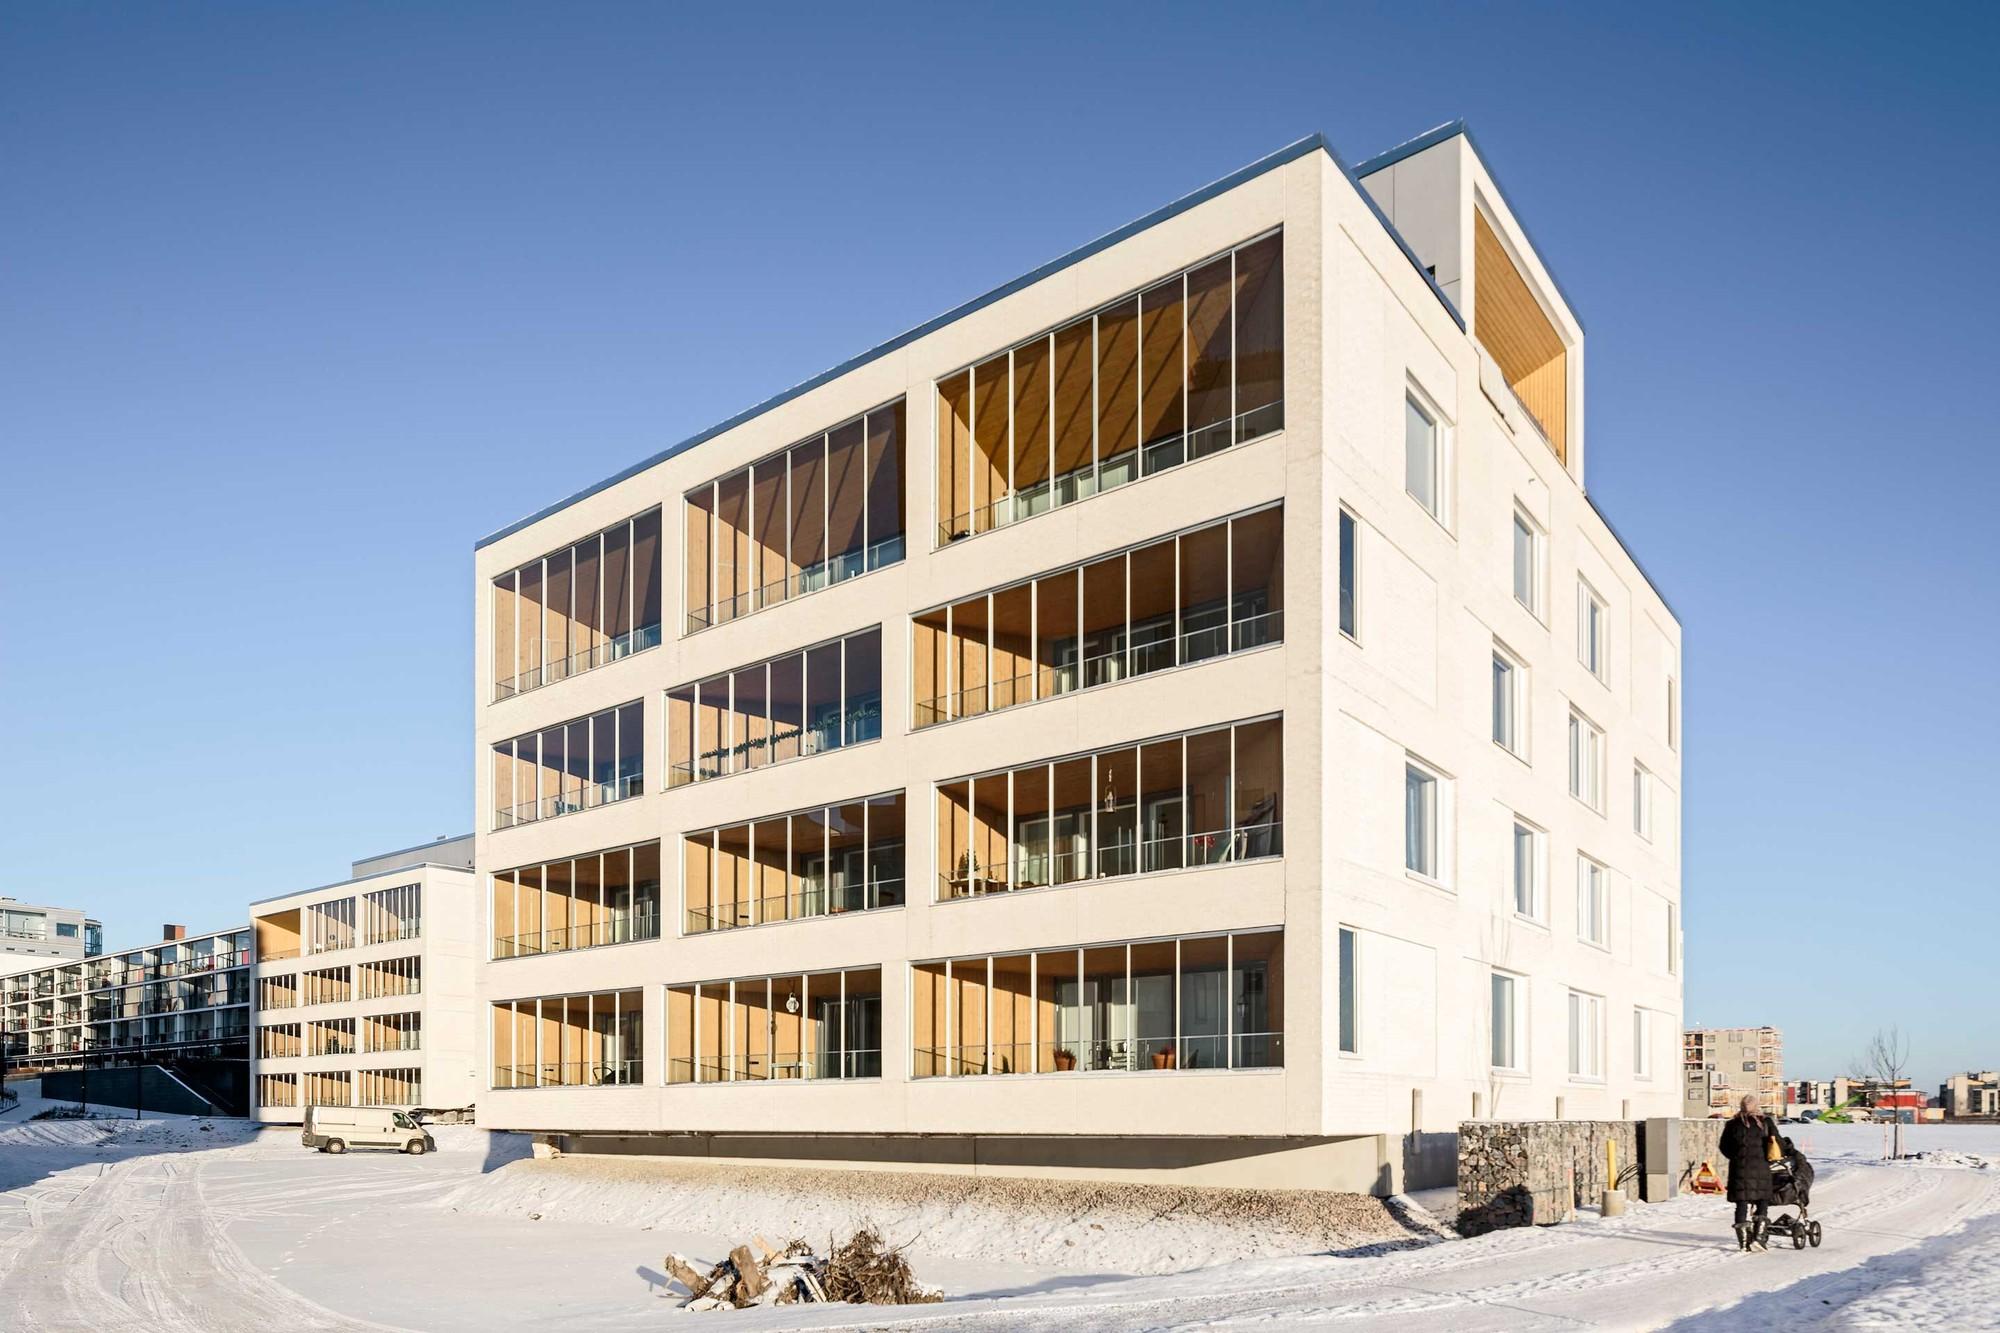 Edificio de Departamentos Kotisaarenkatu / Playa Arkkitehdit, © Tuomas Uusheimo